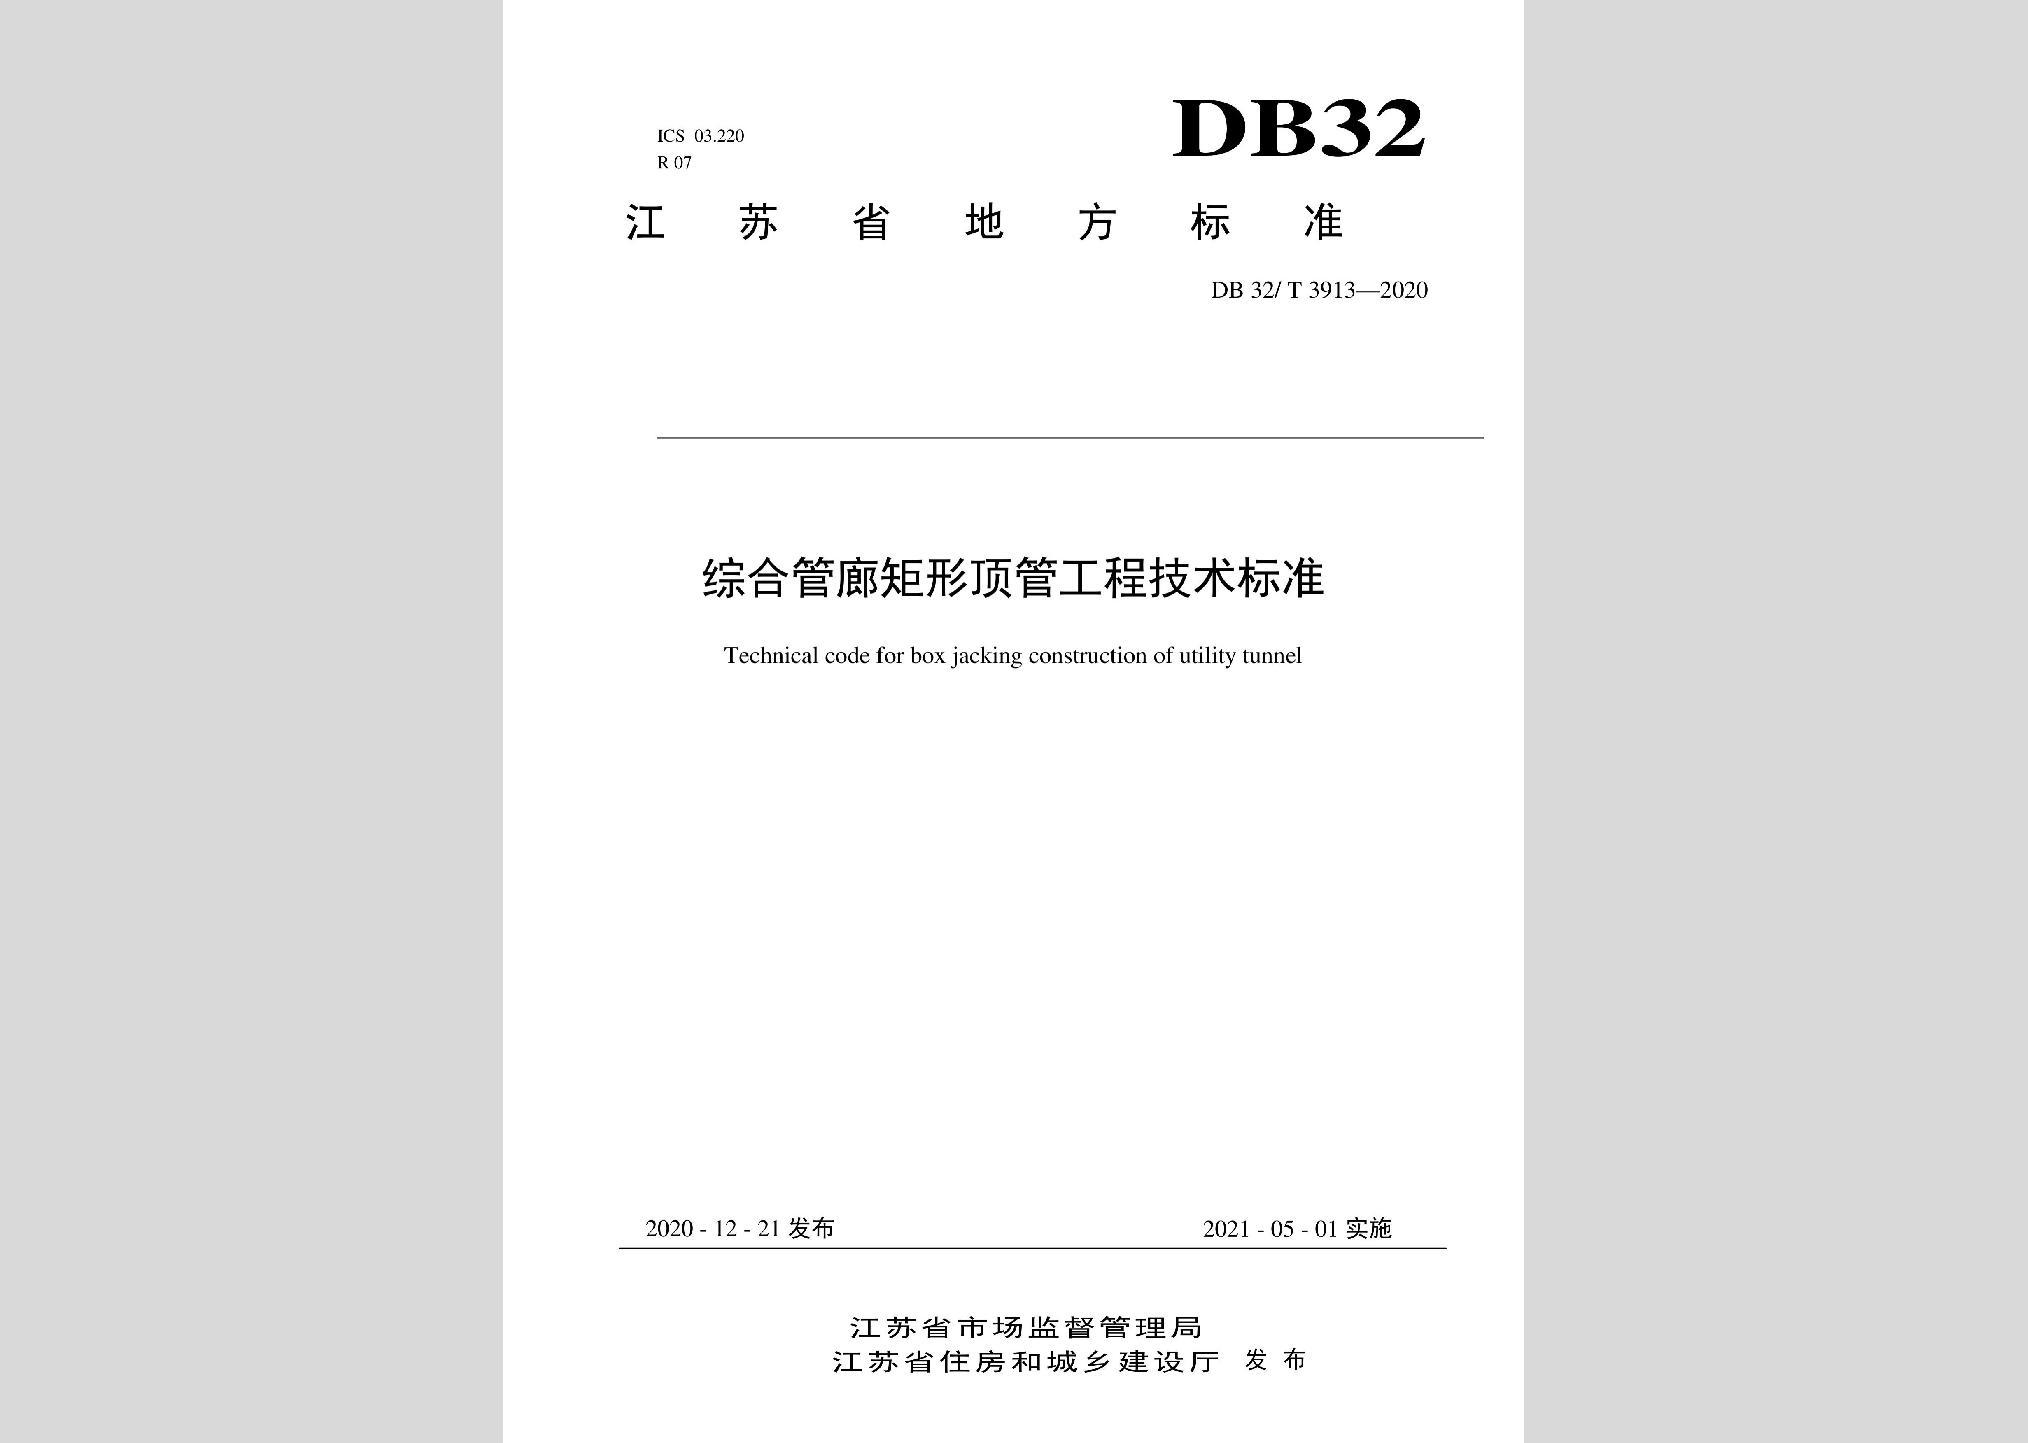 DB32/T3913-2020:综合管廊矩形顶管工程技术标准